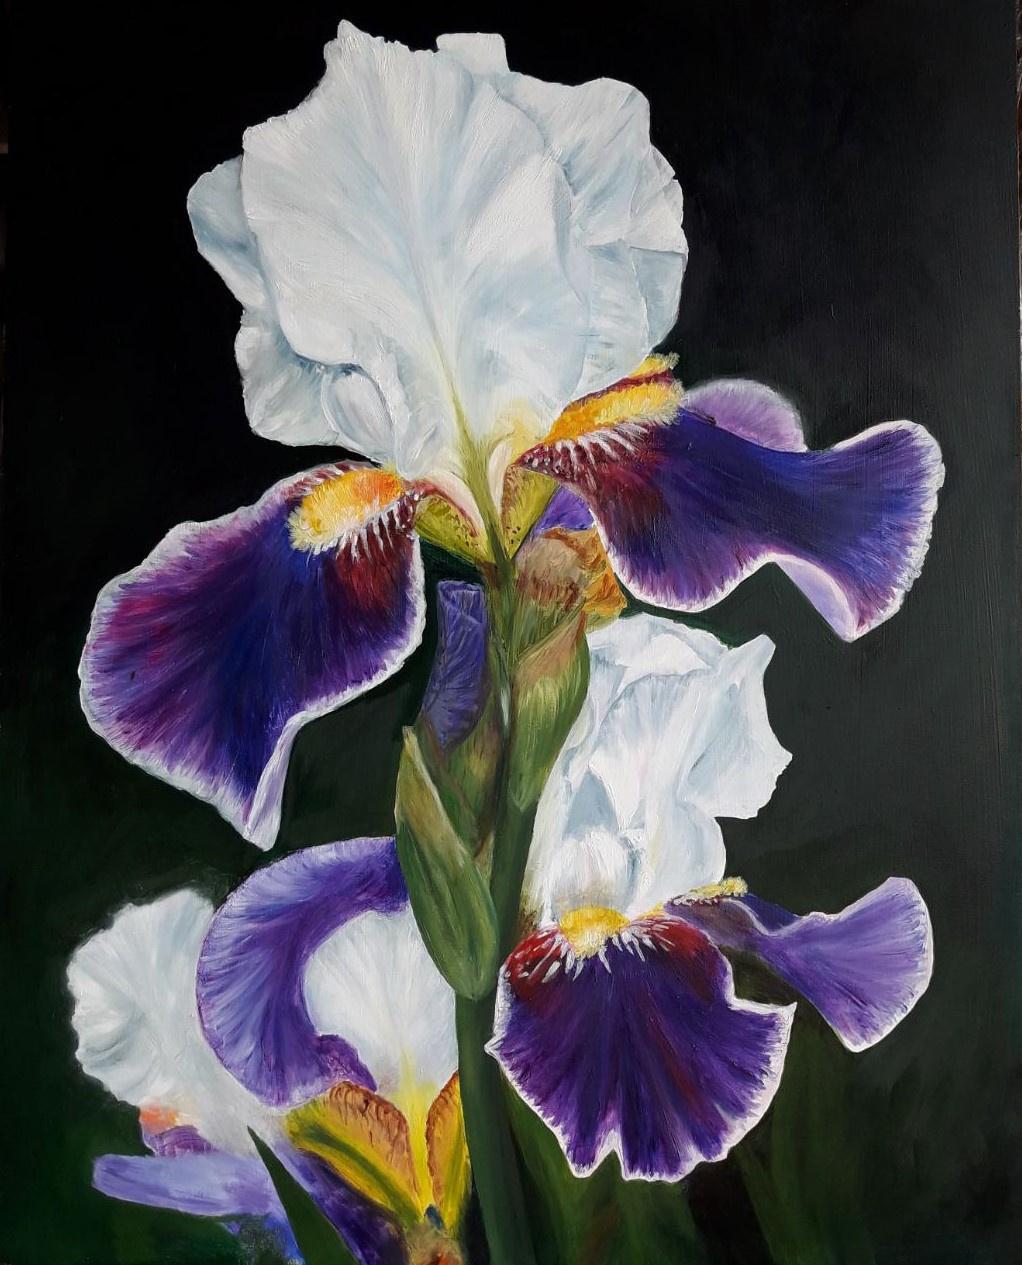 Helena. Iris in the night